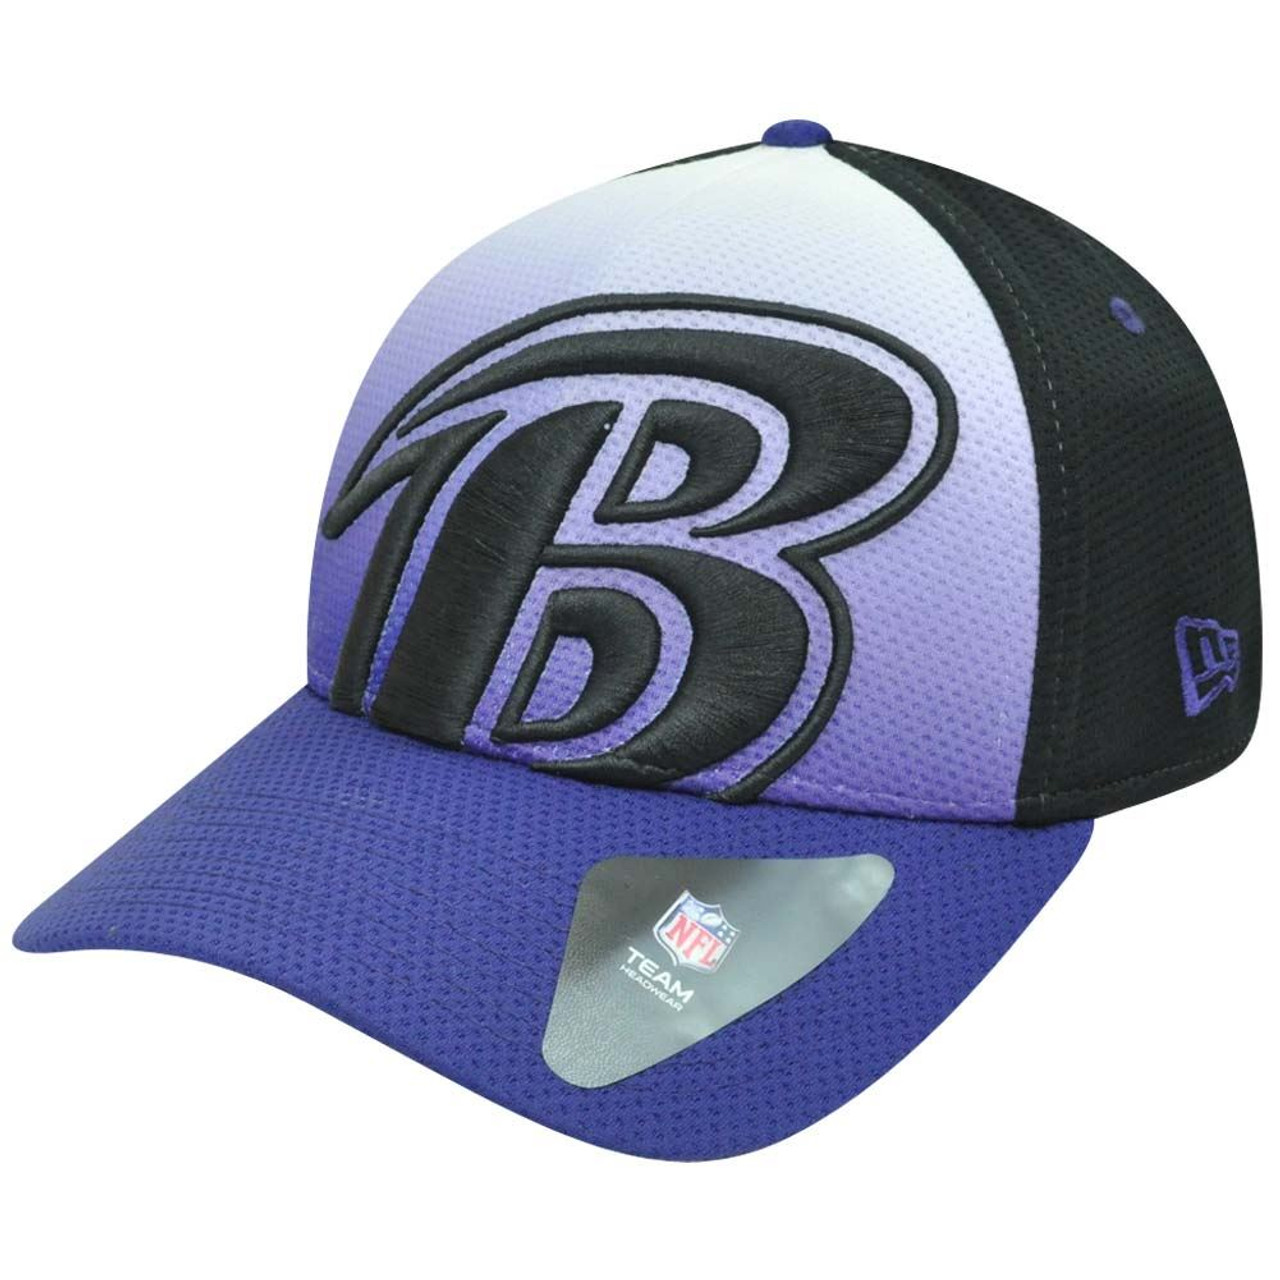 hot sale online 1a5ec 4b2c2 NFL New Era 39Thirty 3930 Gradation Baltimore Ravens Flex Fit M L Hat Cap -  Cap Store Online.com